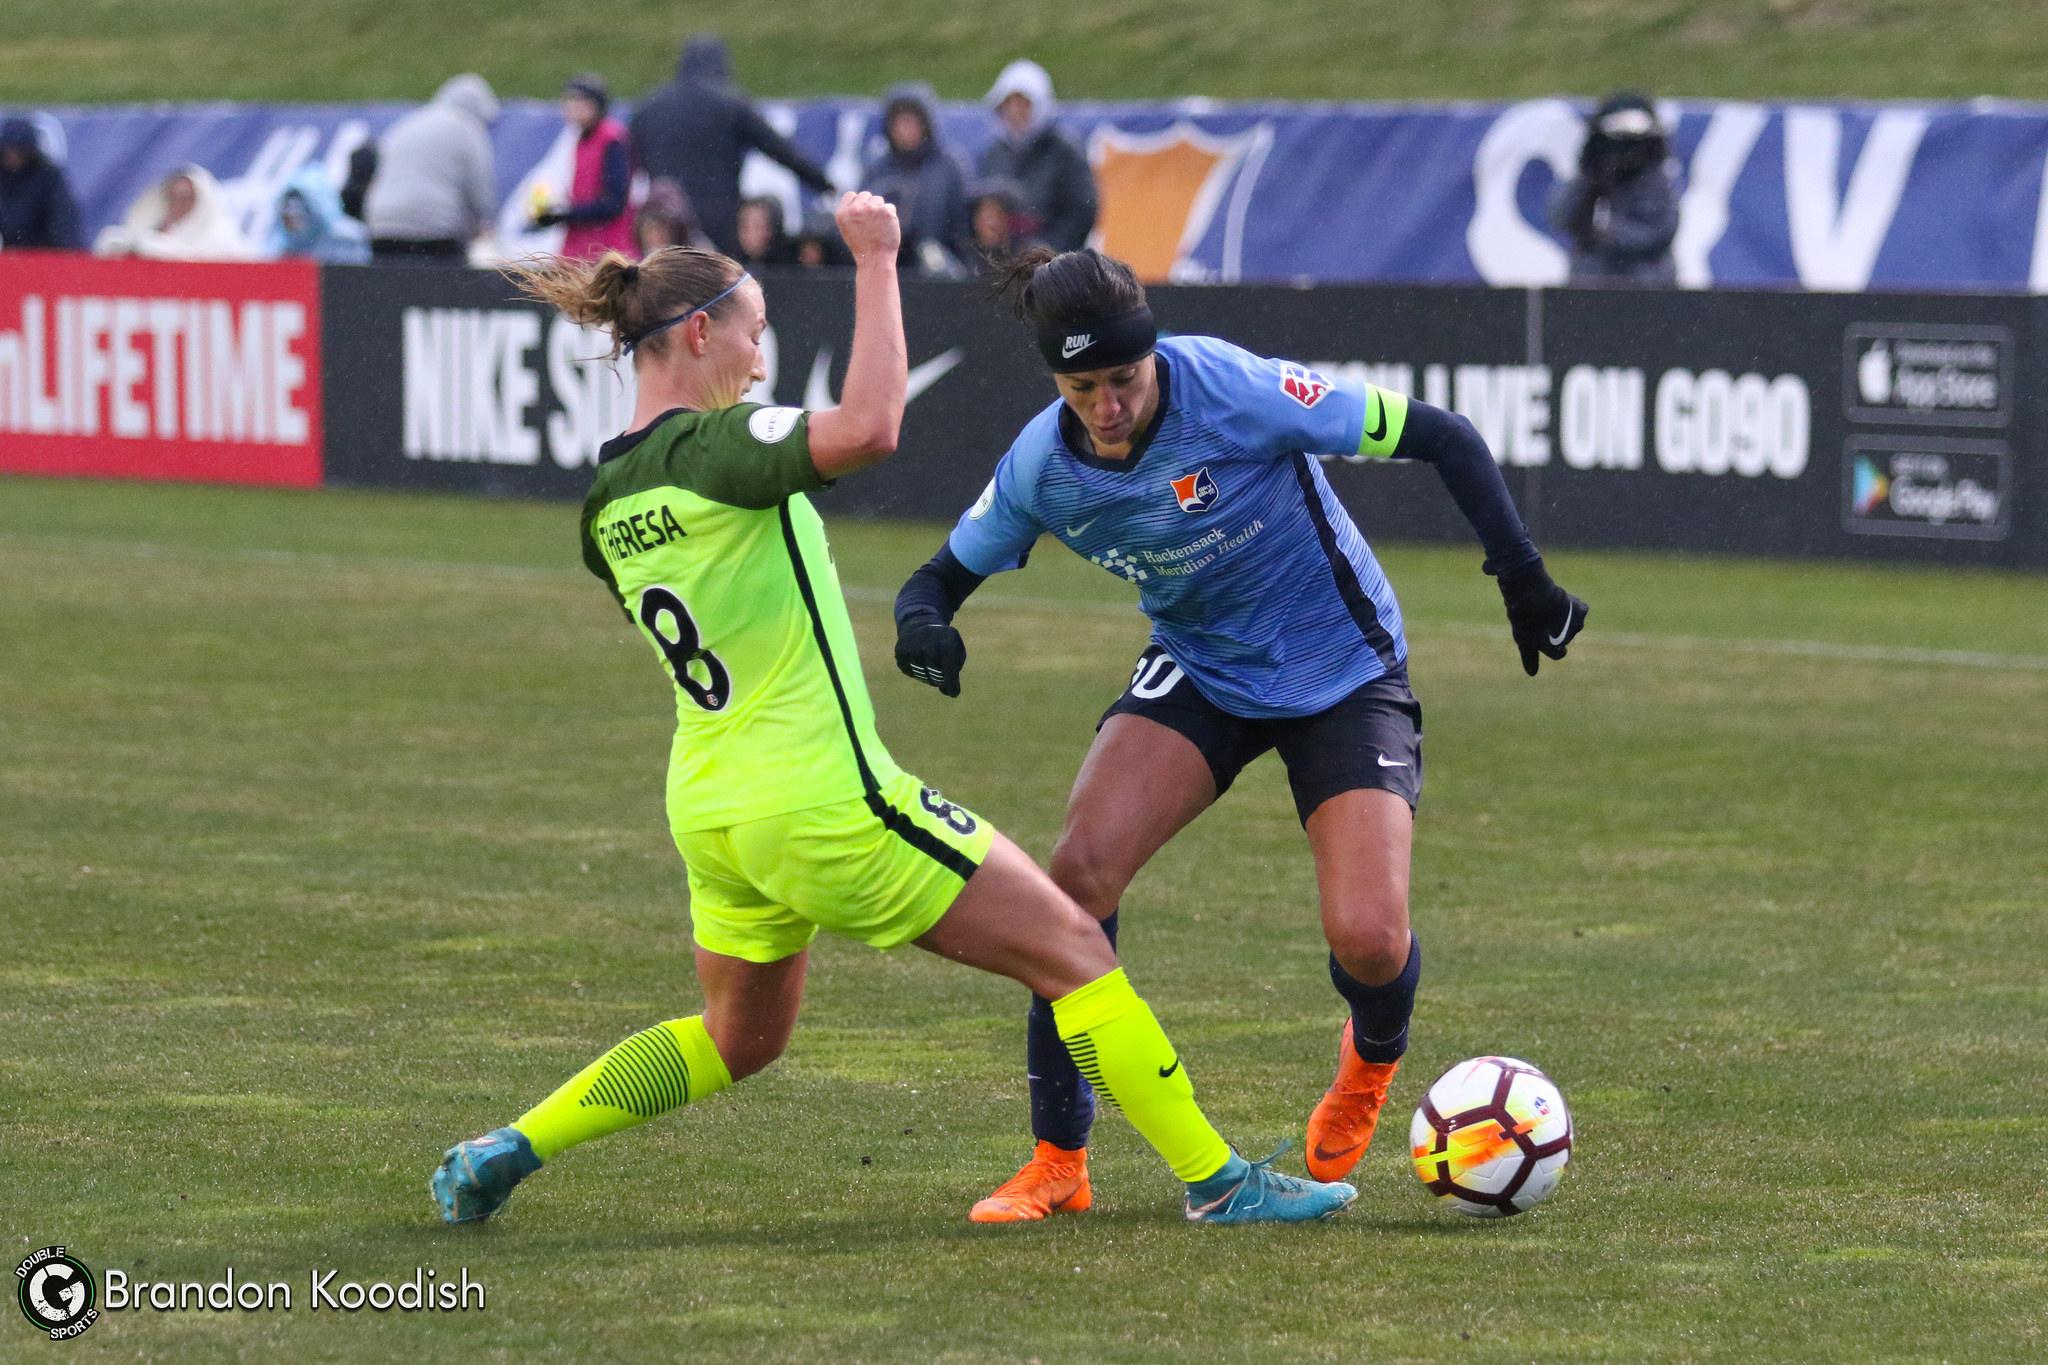 Sky Blue vs Seattle Reign